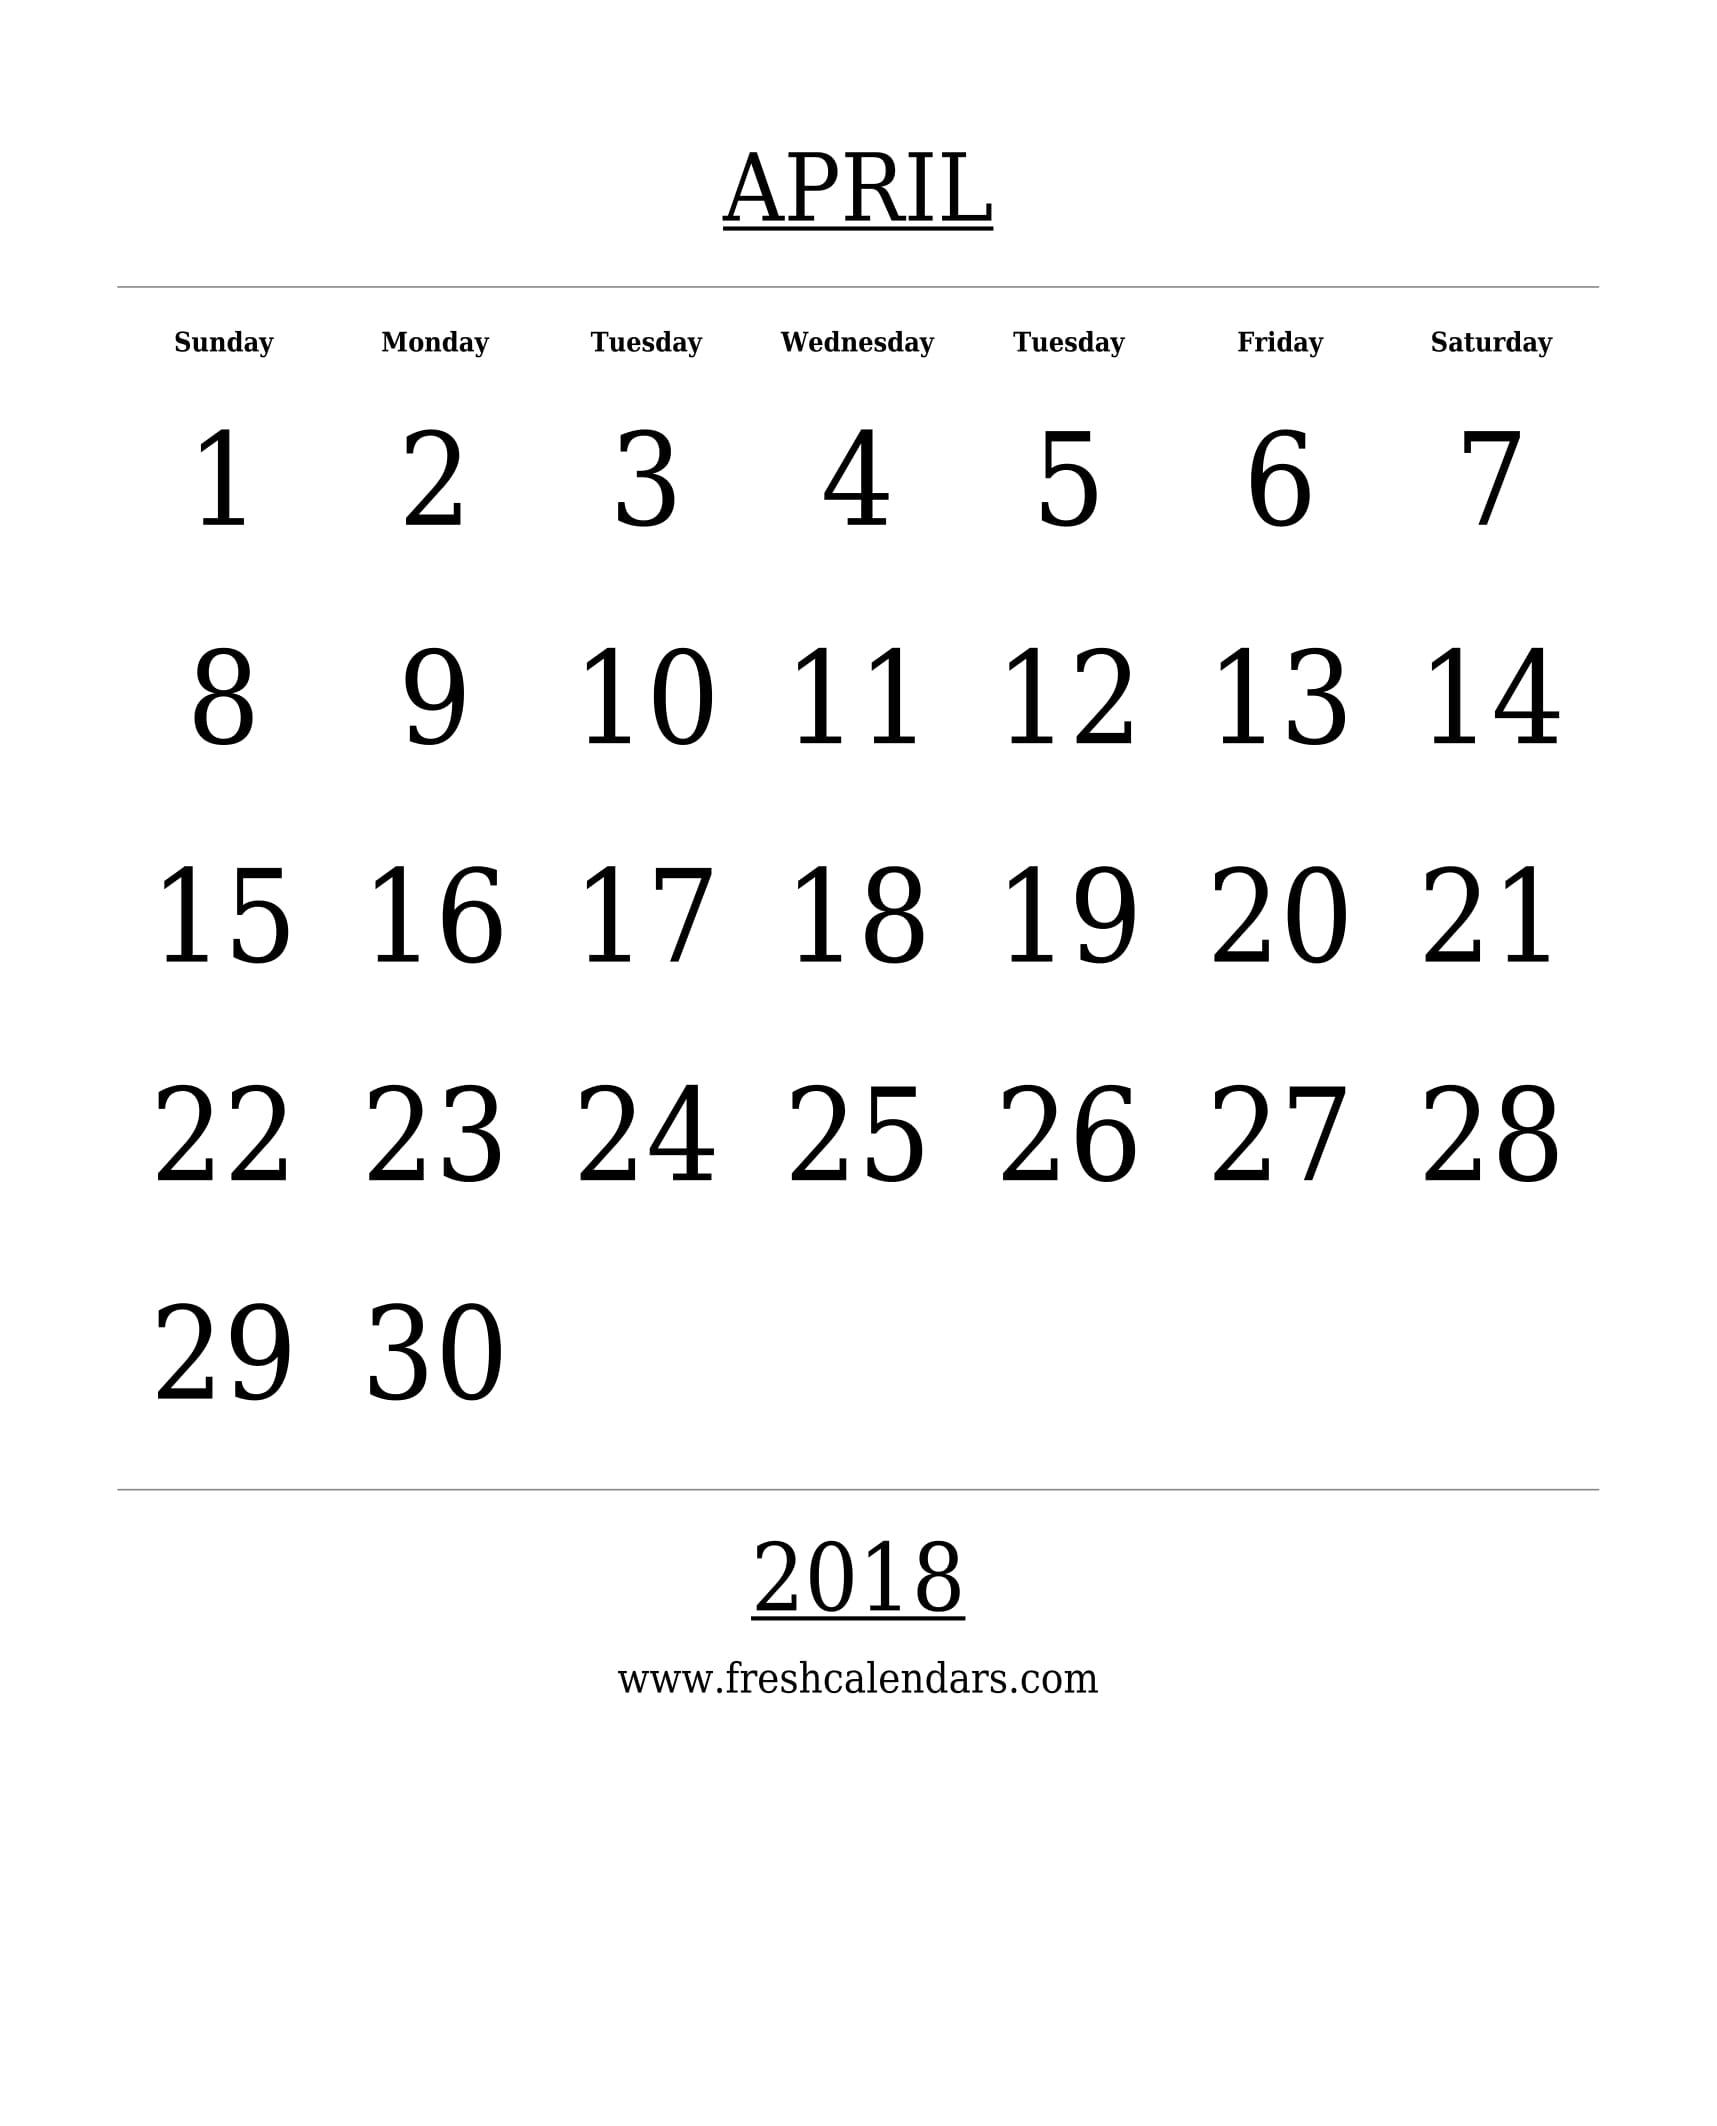 Free Printable Template April 2018 Calendar Bold Style 89uj